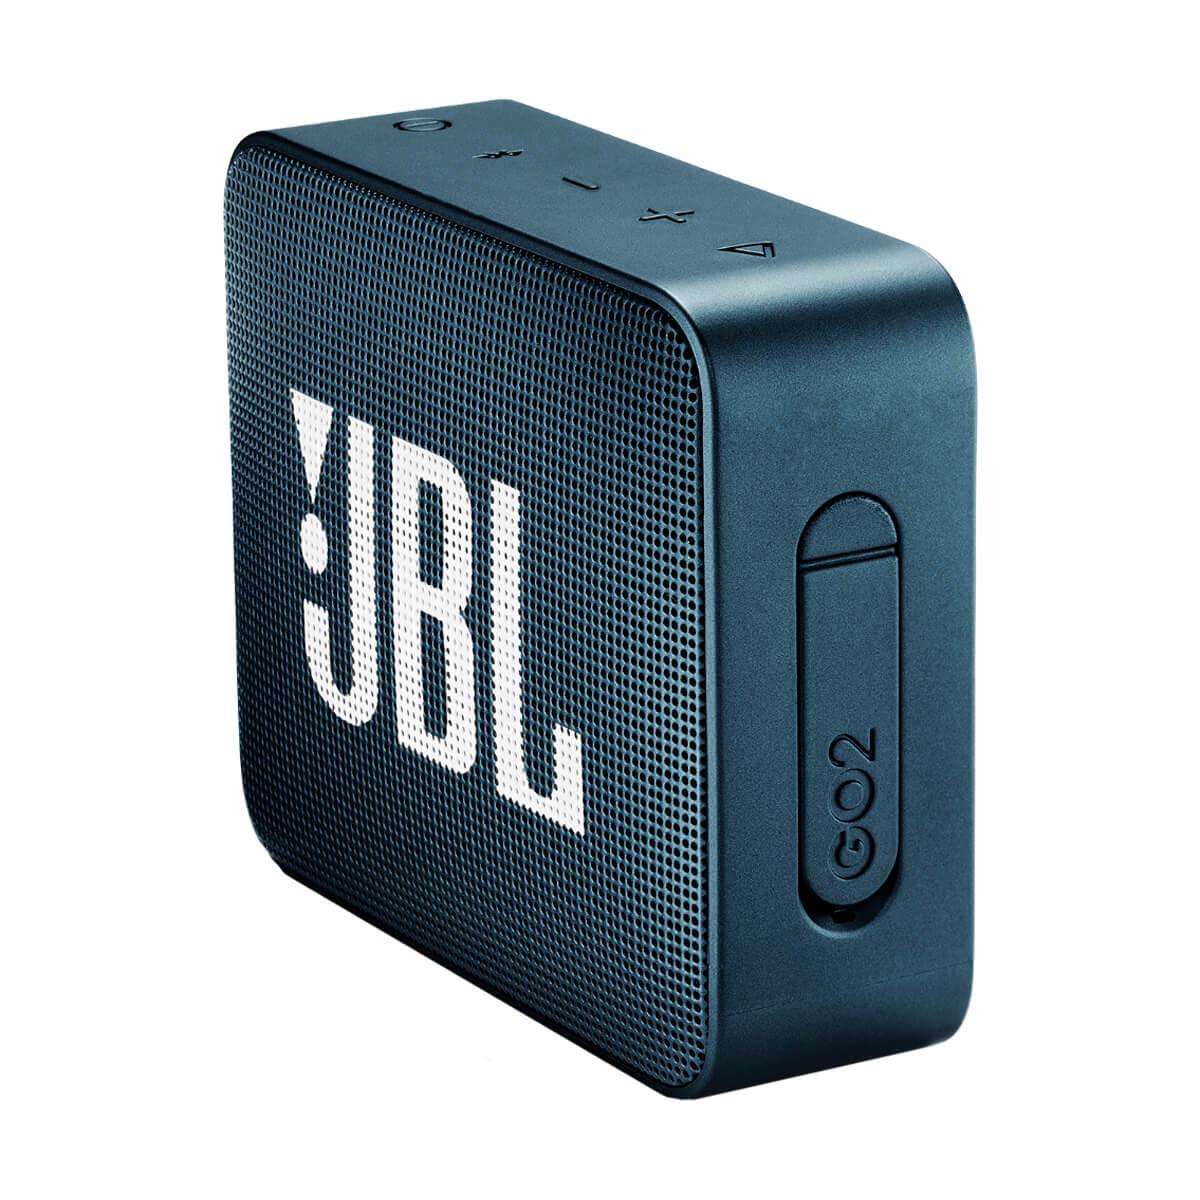 Оригинальная Акустика JBL GO 2 Slate Navy (JBLGO2NAVY)